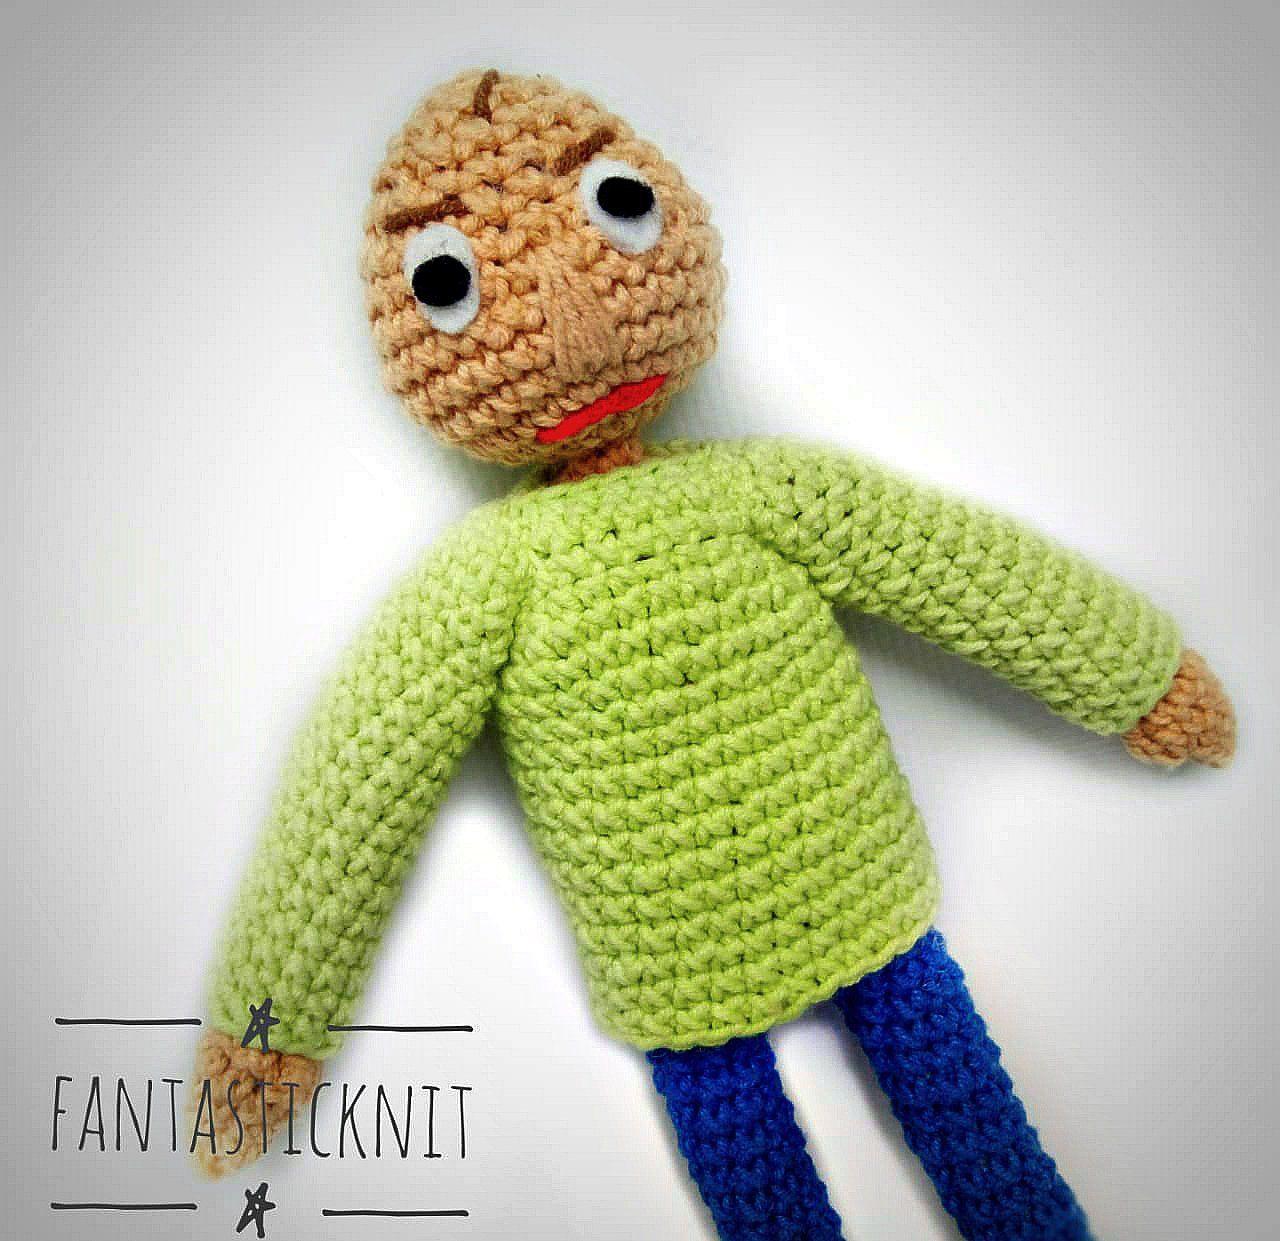 Baldi Crochet Baldi S Basics In Education And Learning Handmade Soft Toy Handmade Soft Toys Crochet Handmade